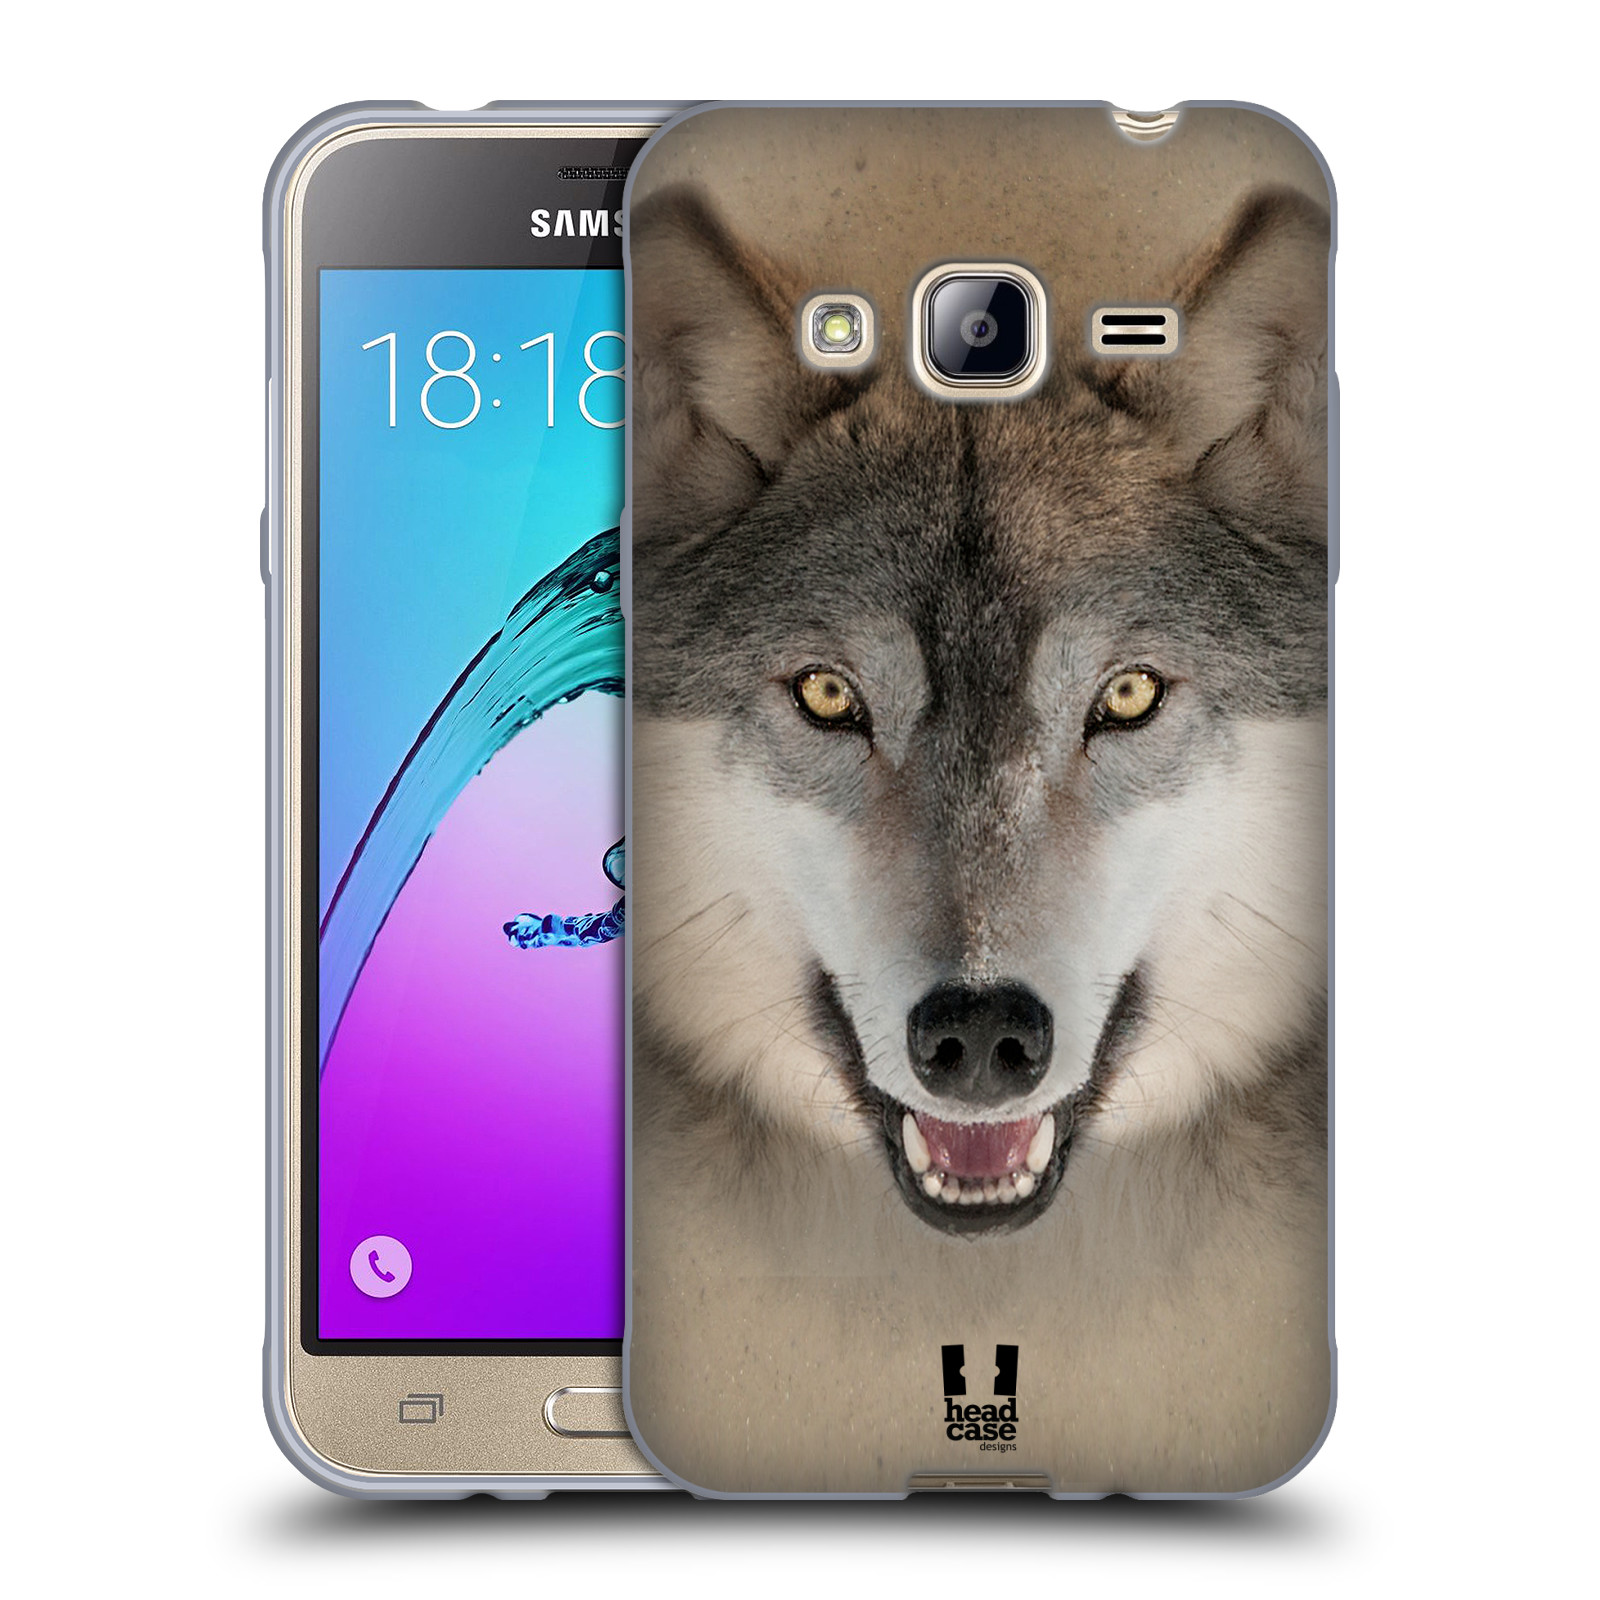 HEAD CASE silikonový obal na mobil Samsung Galaxy J3, J3 2016 vzor Zvířecí tváře 2 vlk šedý